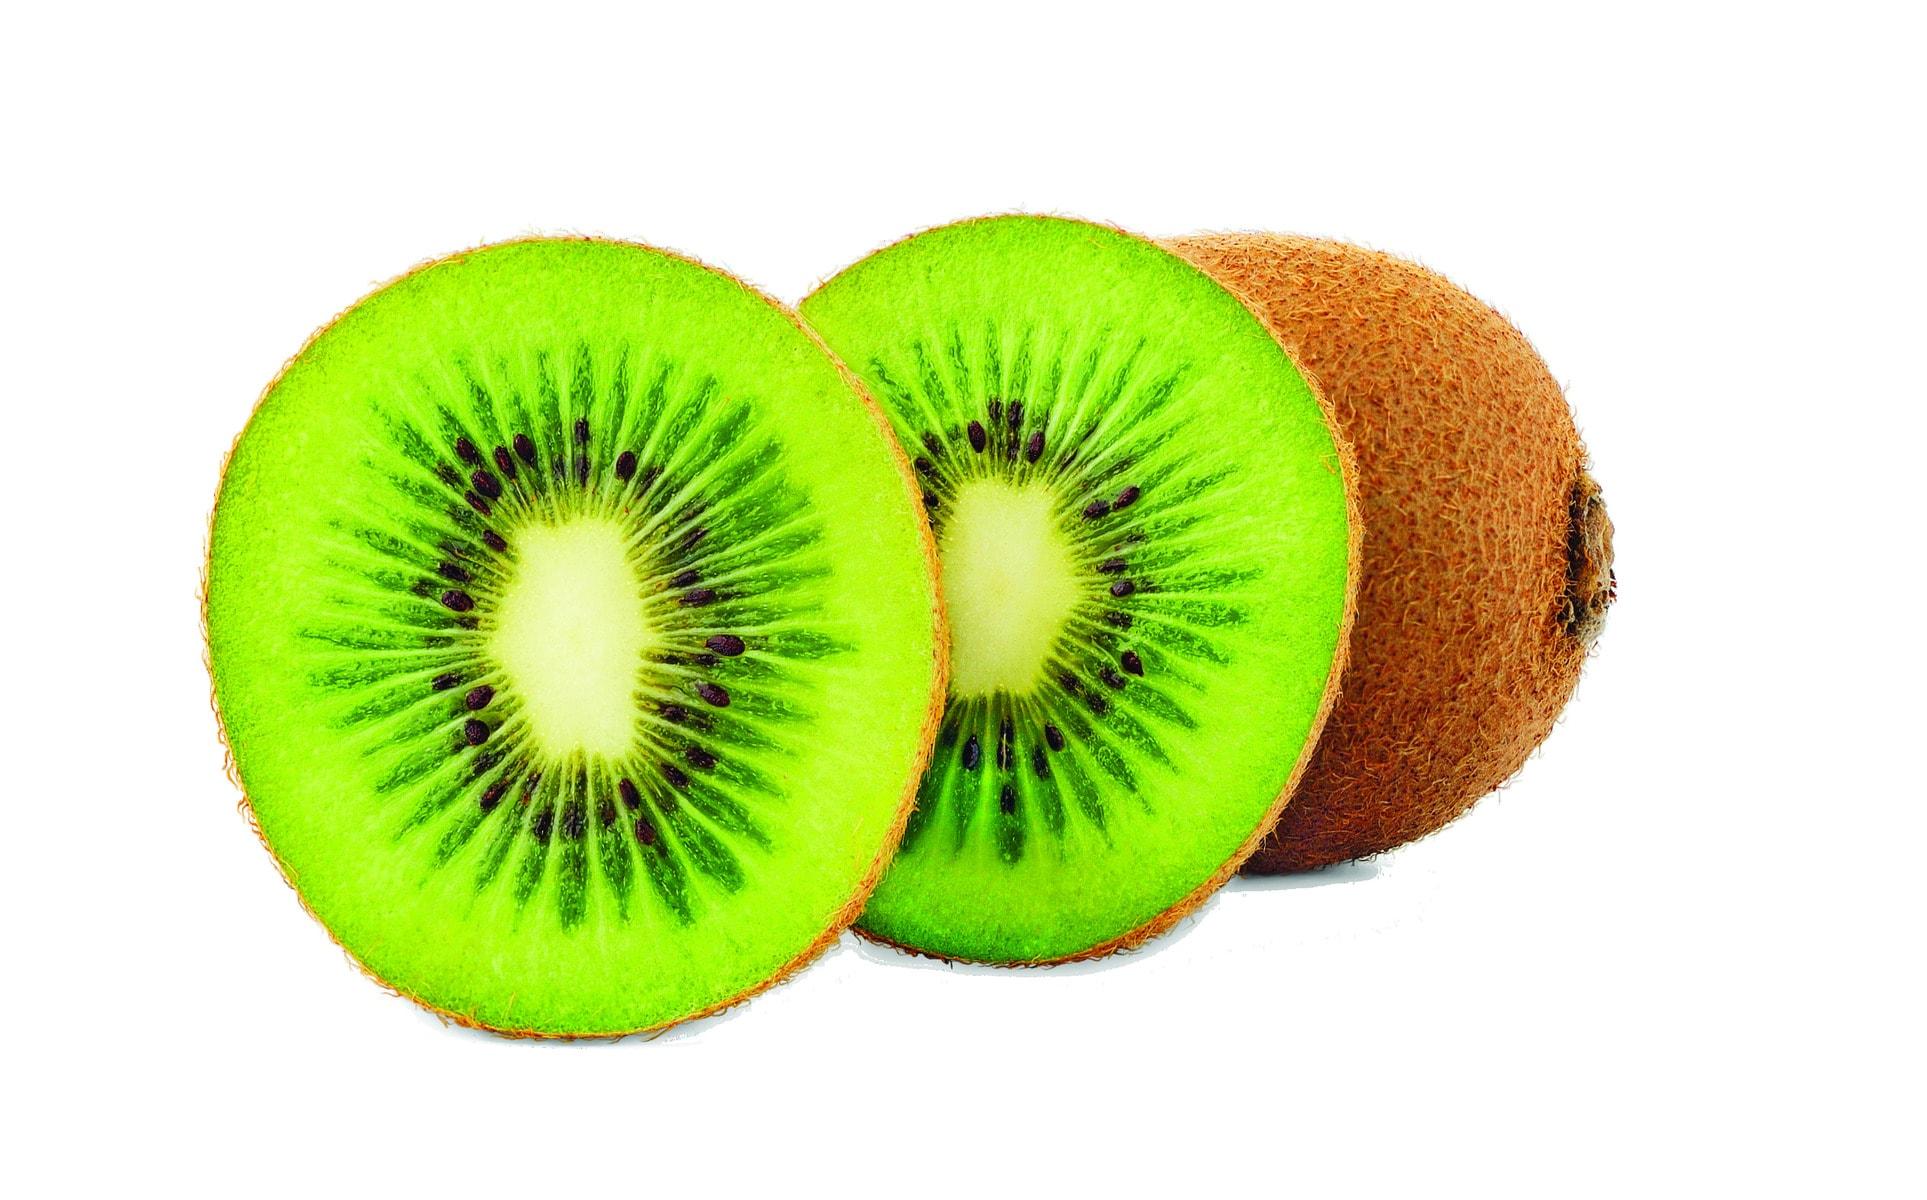 In Season Mid Winter Kiwifruit Healthy Food Guide